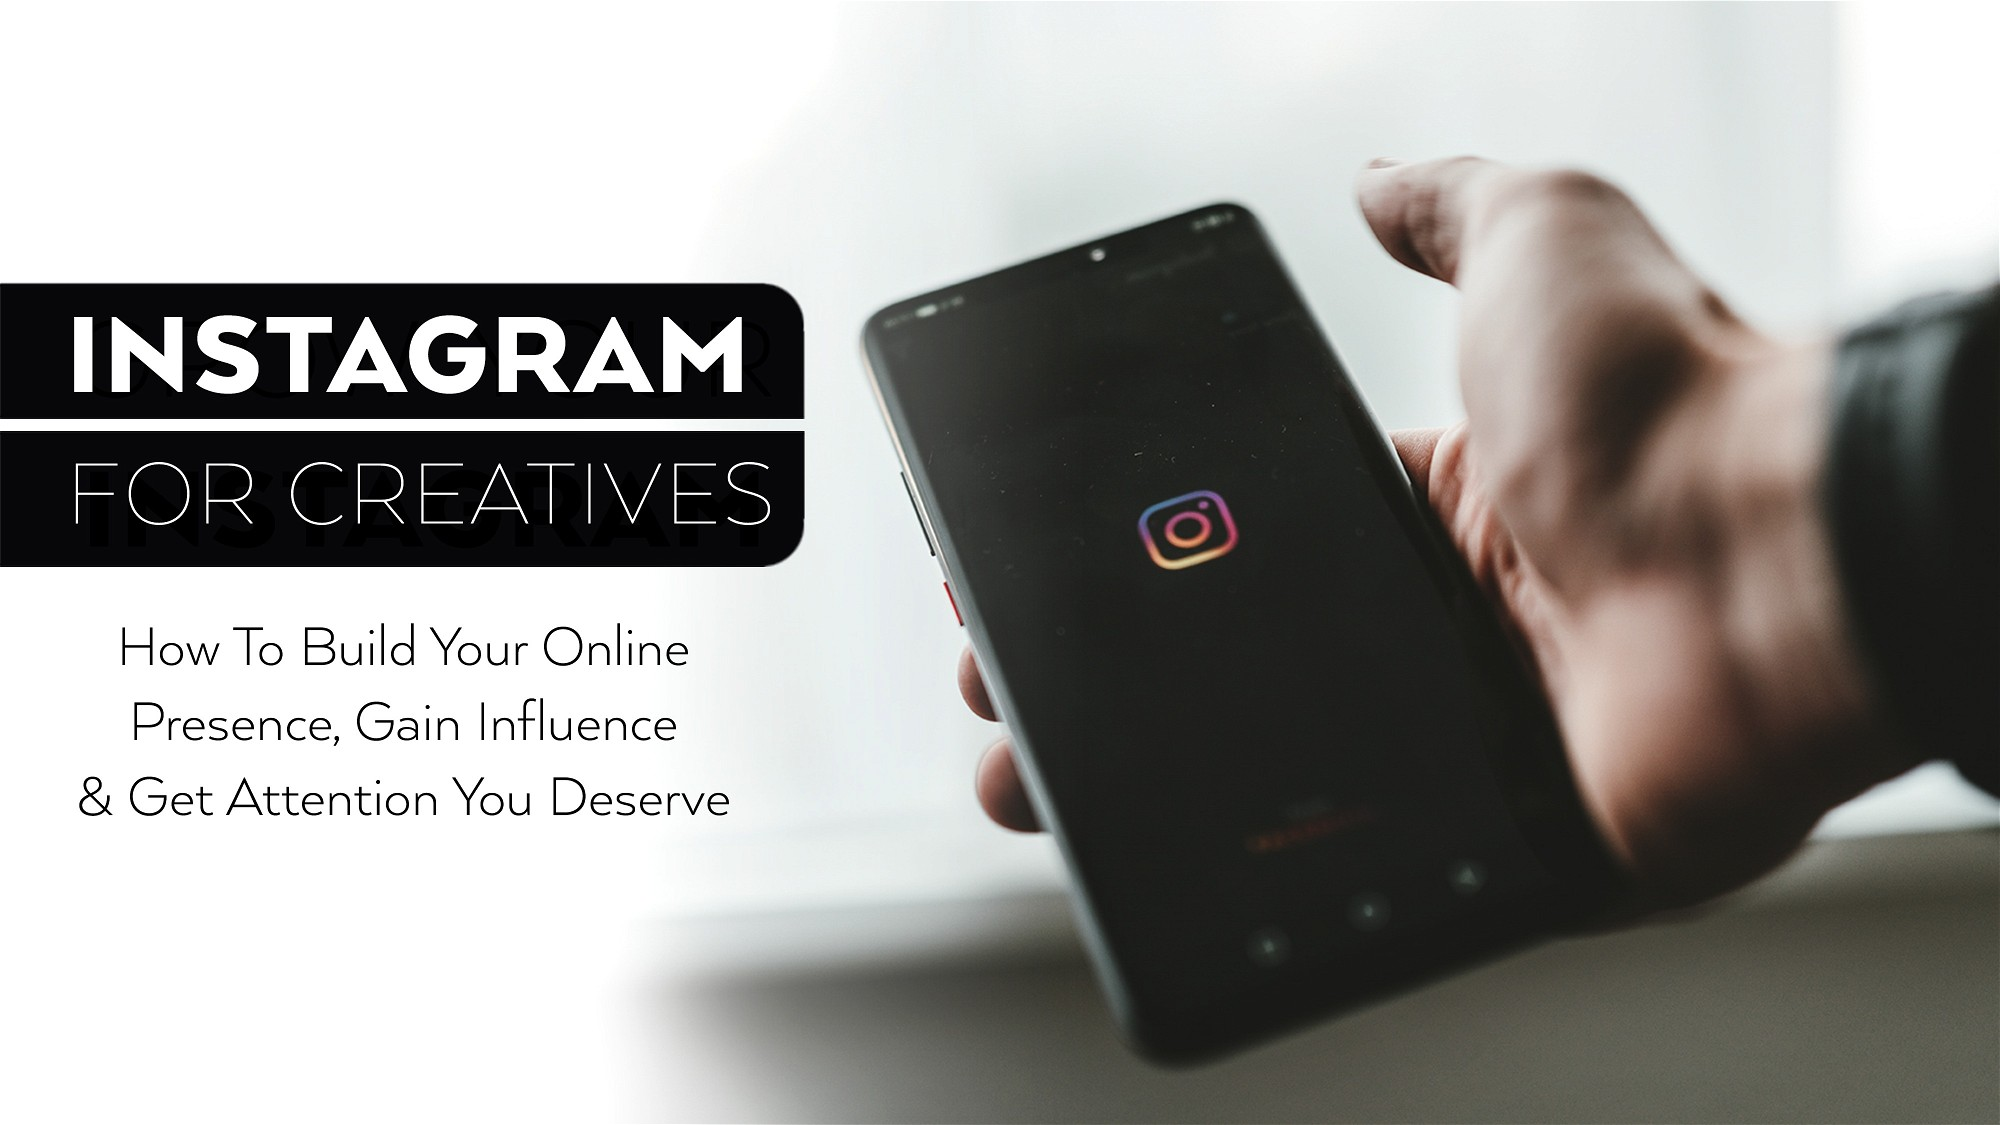 AppSumo Deal for Instagram for Creatives